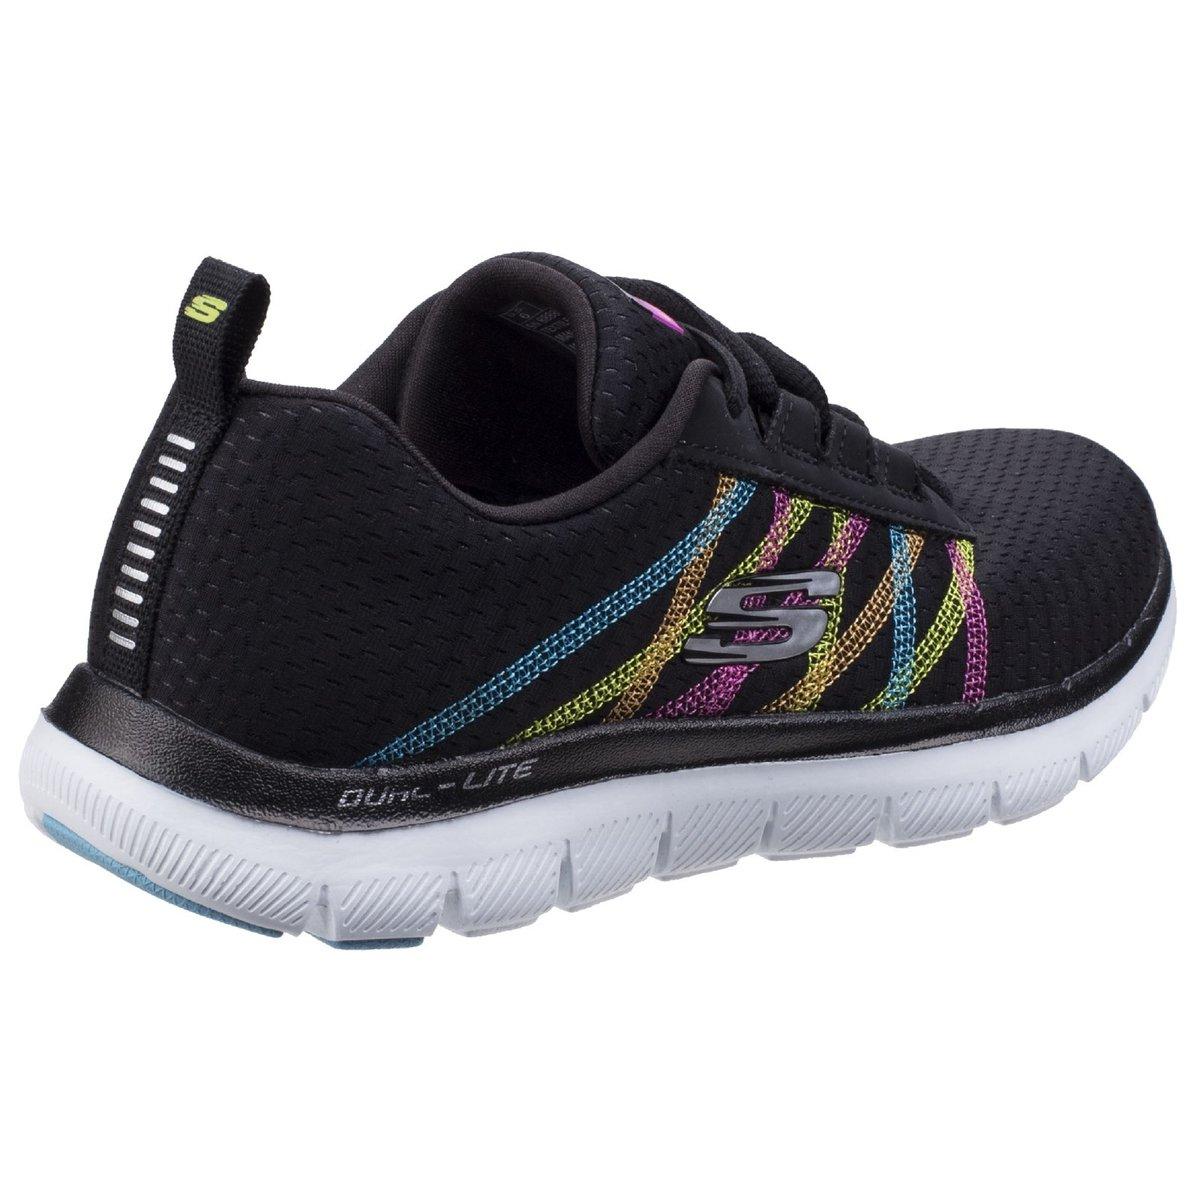 Skechers-Zapatillas-modelo-Flex-Appeal-2-0-Act-Cool-para-mujer-FS5197 miniatura 9